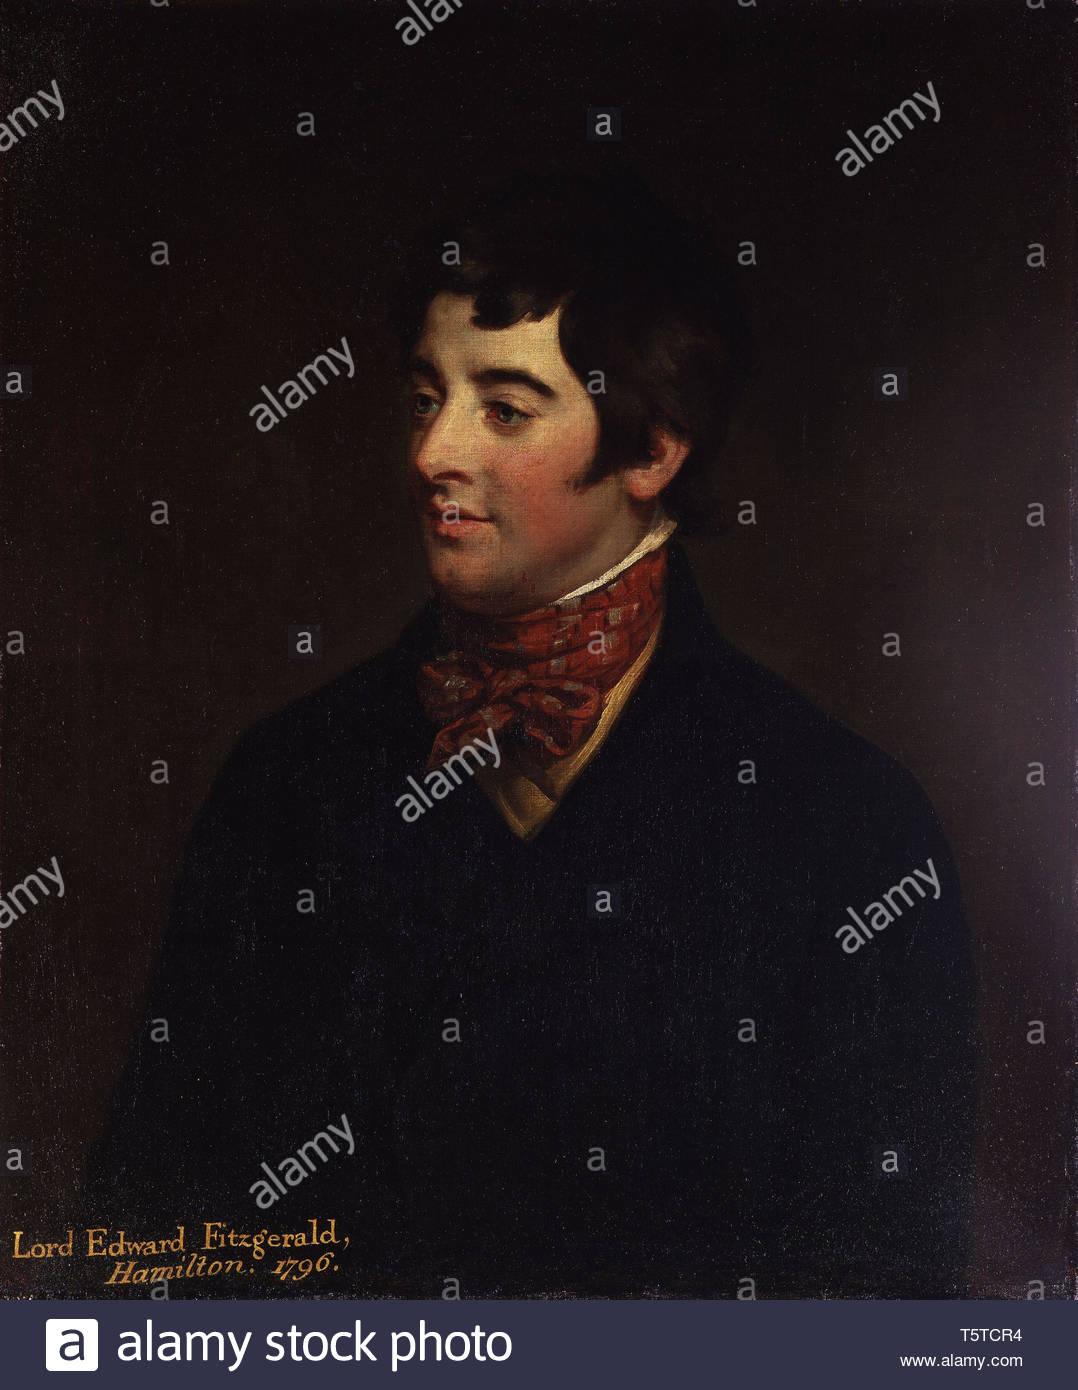 Lord Edward Fitzgerald - Hugh Douglas Hamilton - Stock Image